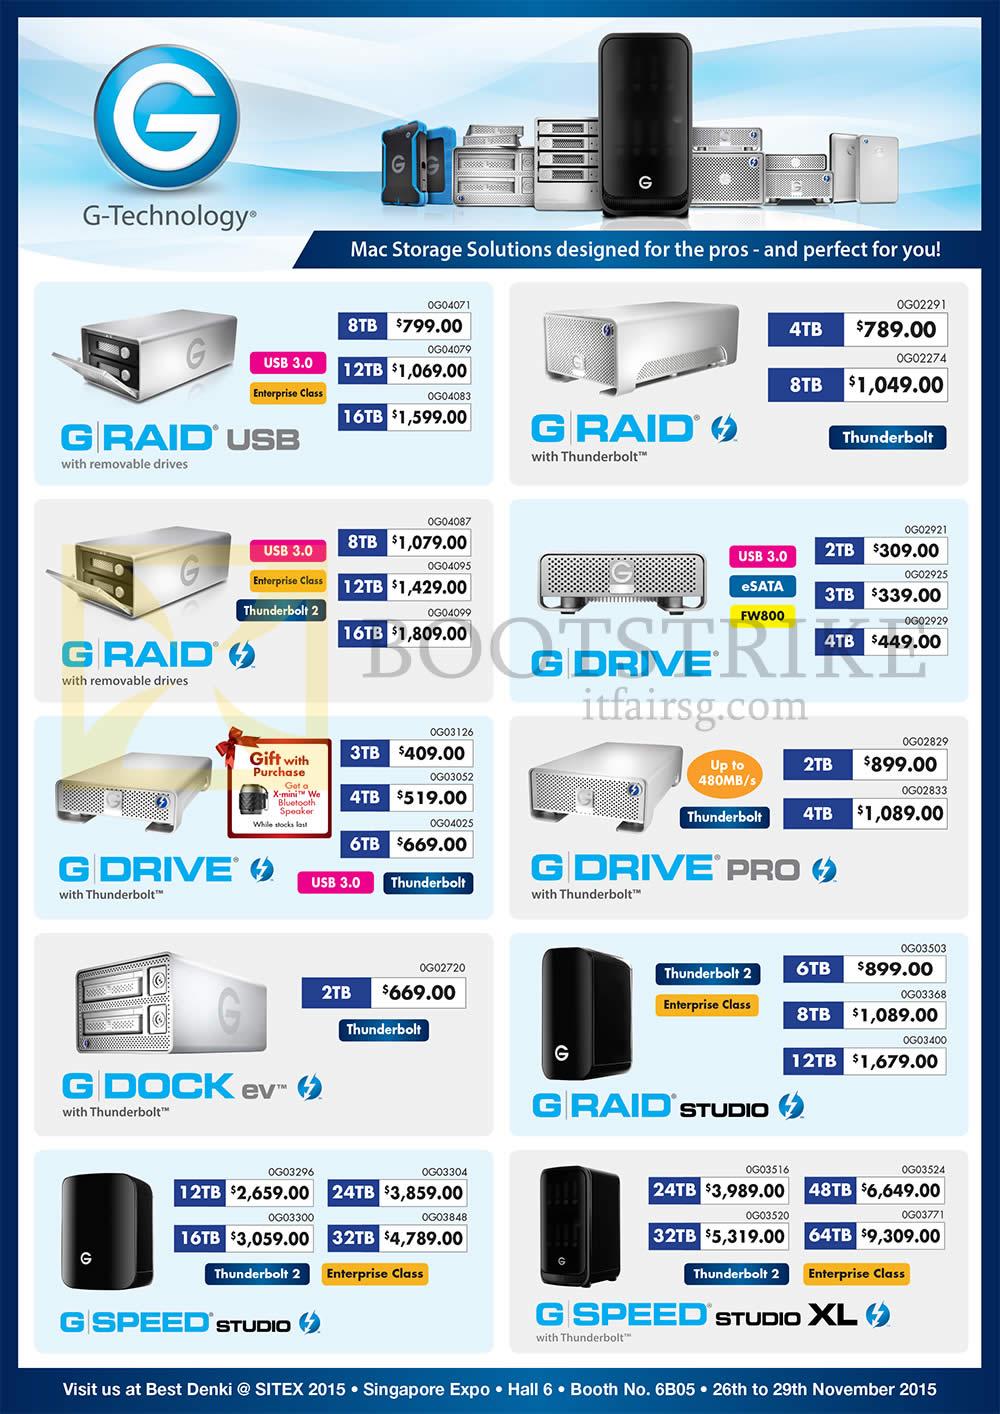 SITEX 2015 price list image brochure of G-Technology Storage Solutions G Raid USB, With Thunderbolt, With Removable Drives, Studio, G Drive, Pro, G Dock Ev, G Raid Studio, G Speed Studio